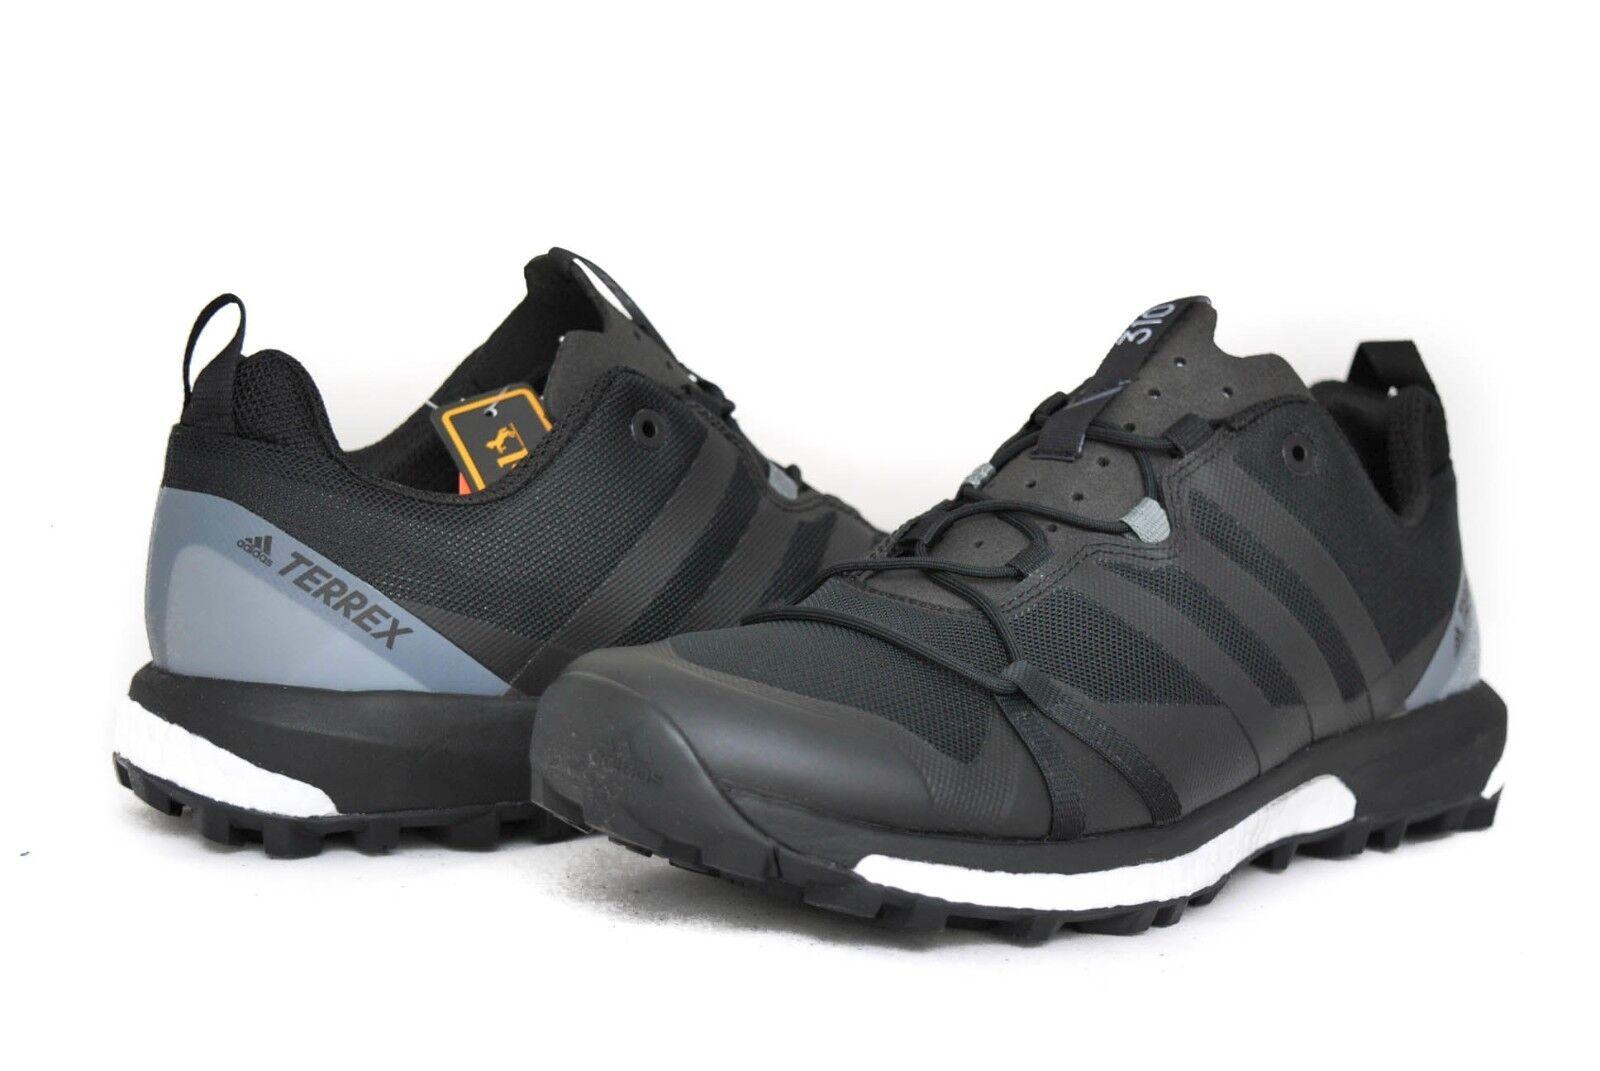 Adidas uomini in sz nero terrex agravic bb0960 vista grey sz in - nuova d0d705